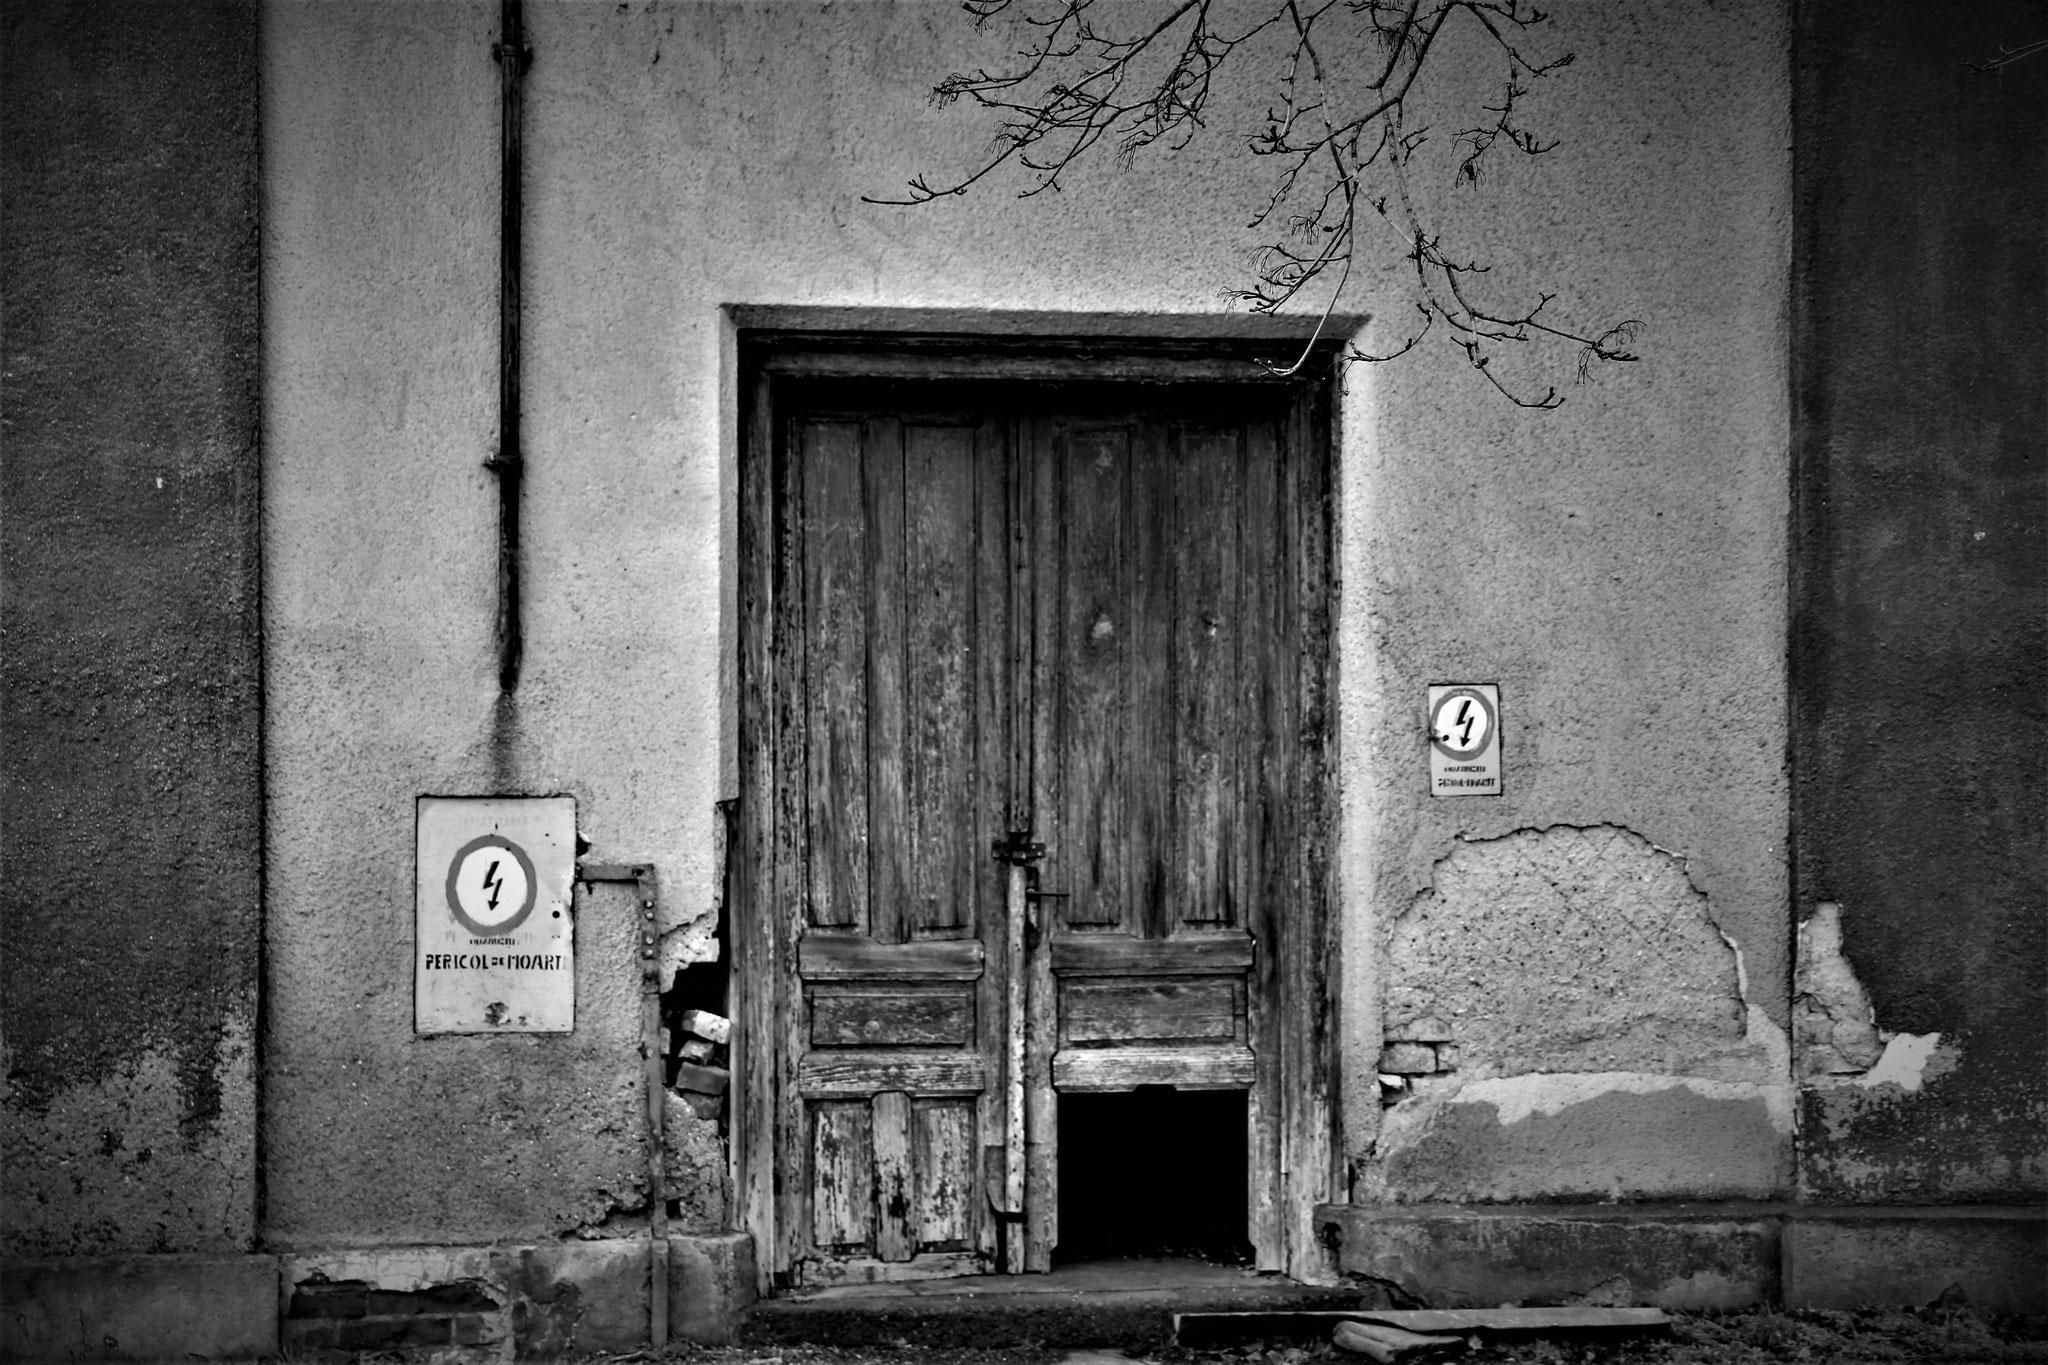 Foto: Cservid Levente-Imre (Săcuieni/ Székelyhíd)